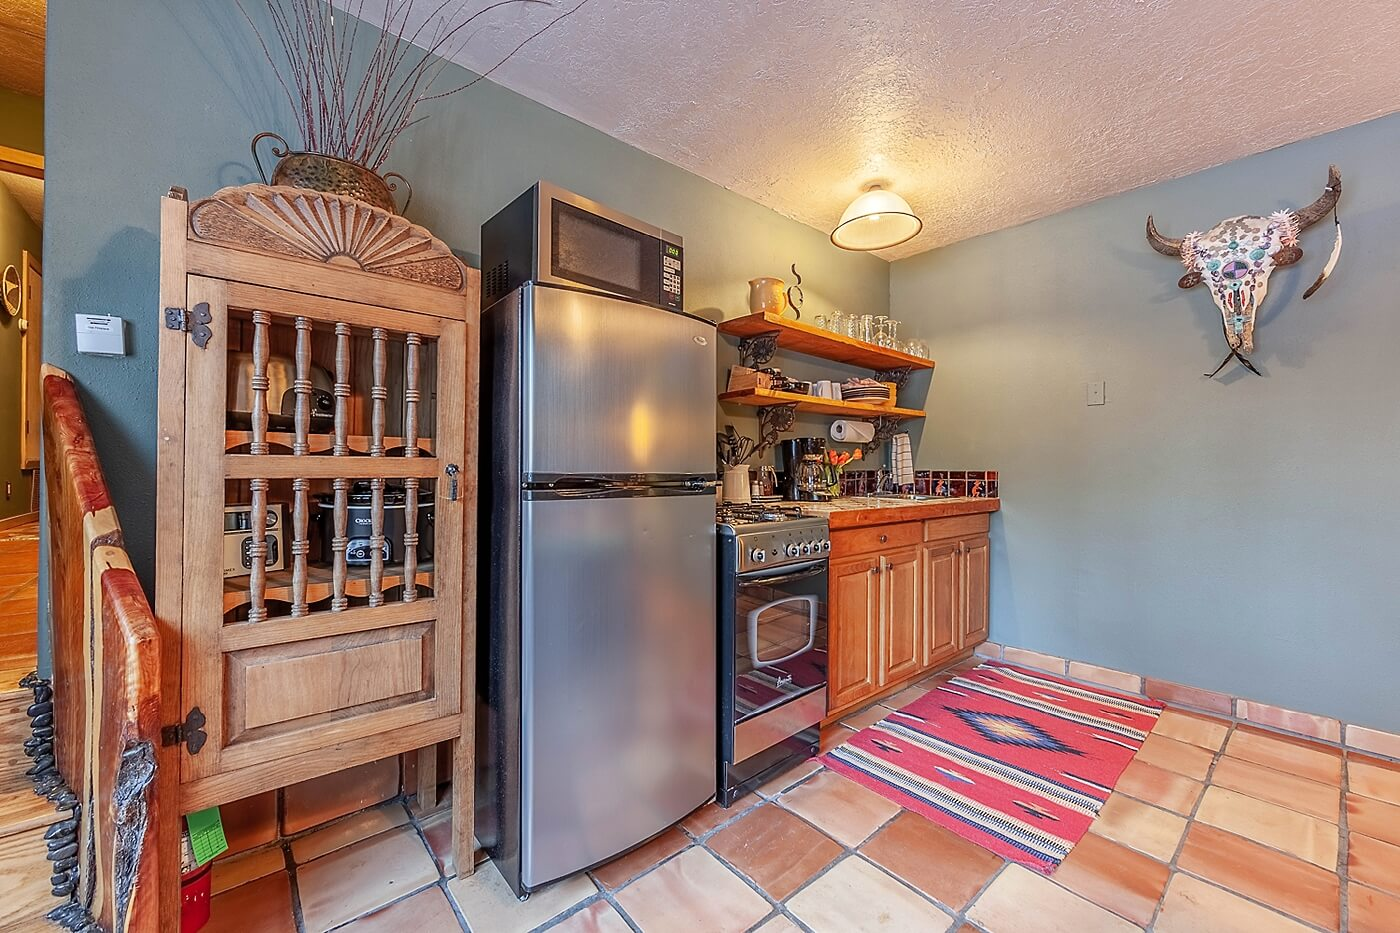 Puerta Blanca kitchen